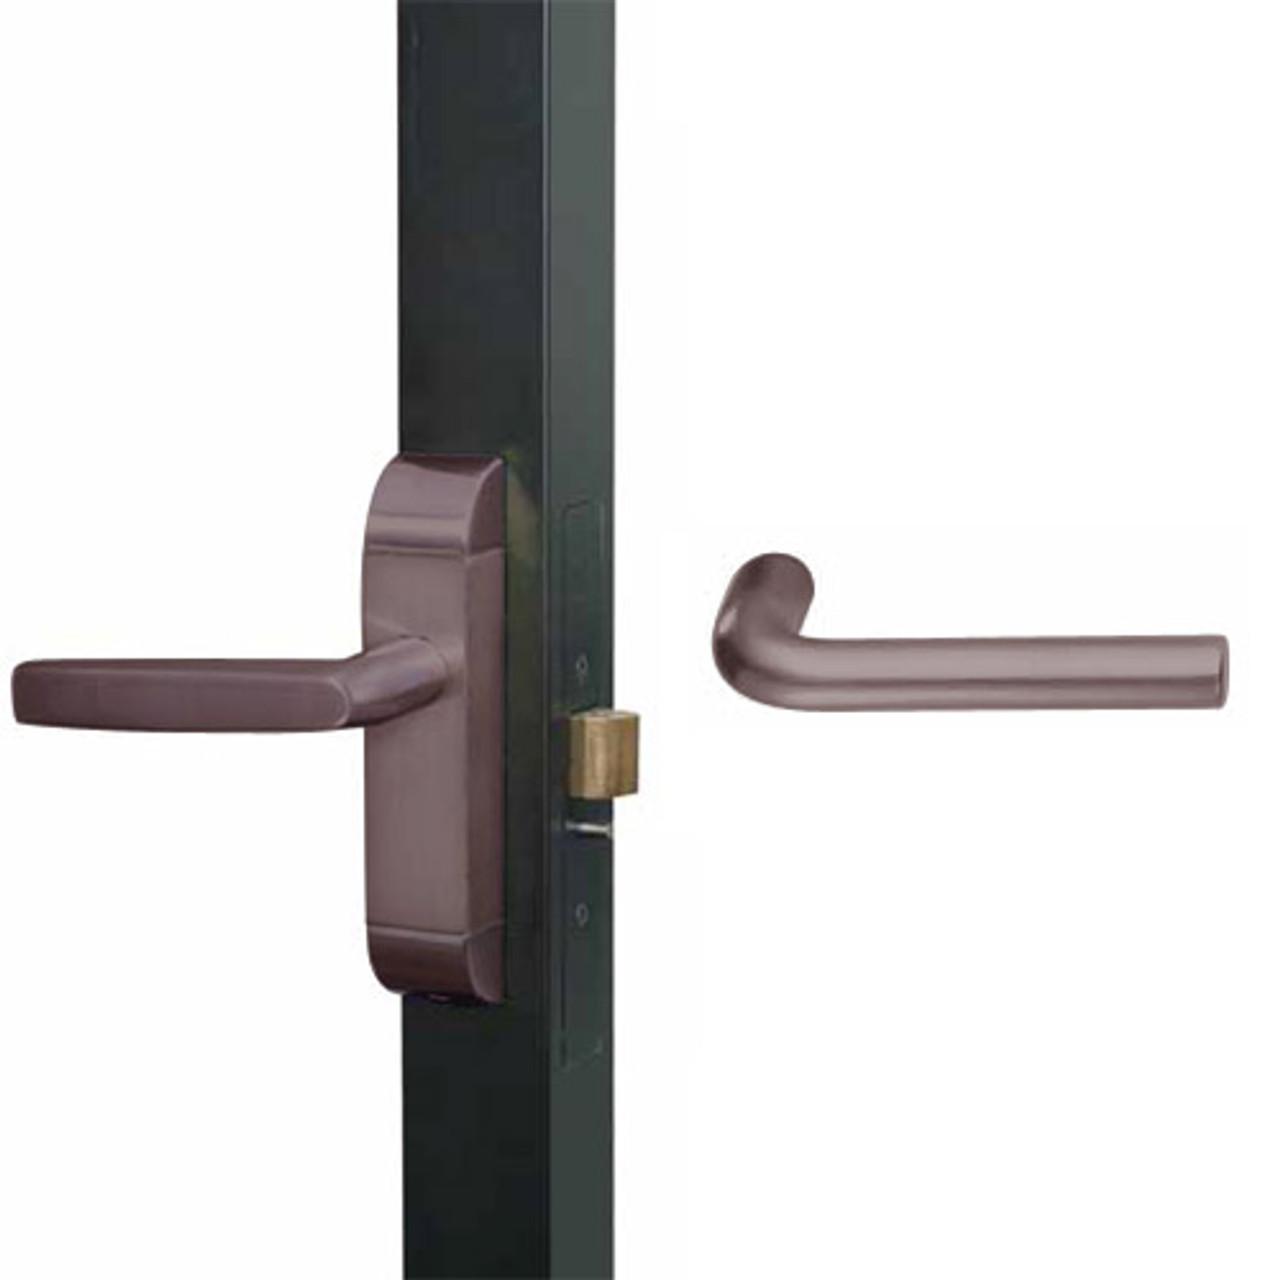 4600-ME-521-US10B Adams Rite ME Designer Deadlatch handle in Oil Rubbed Bronze Finish